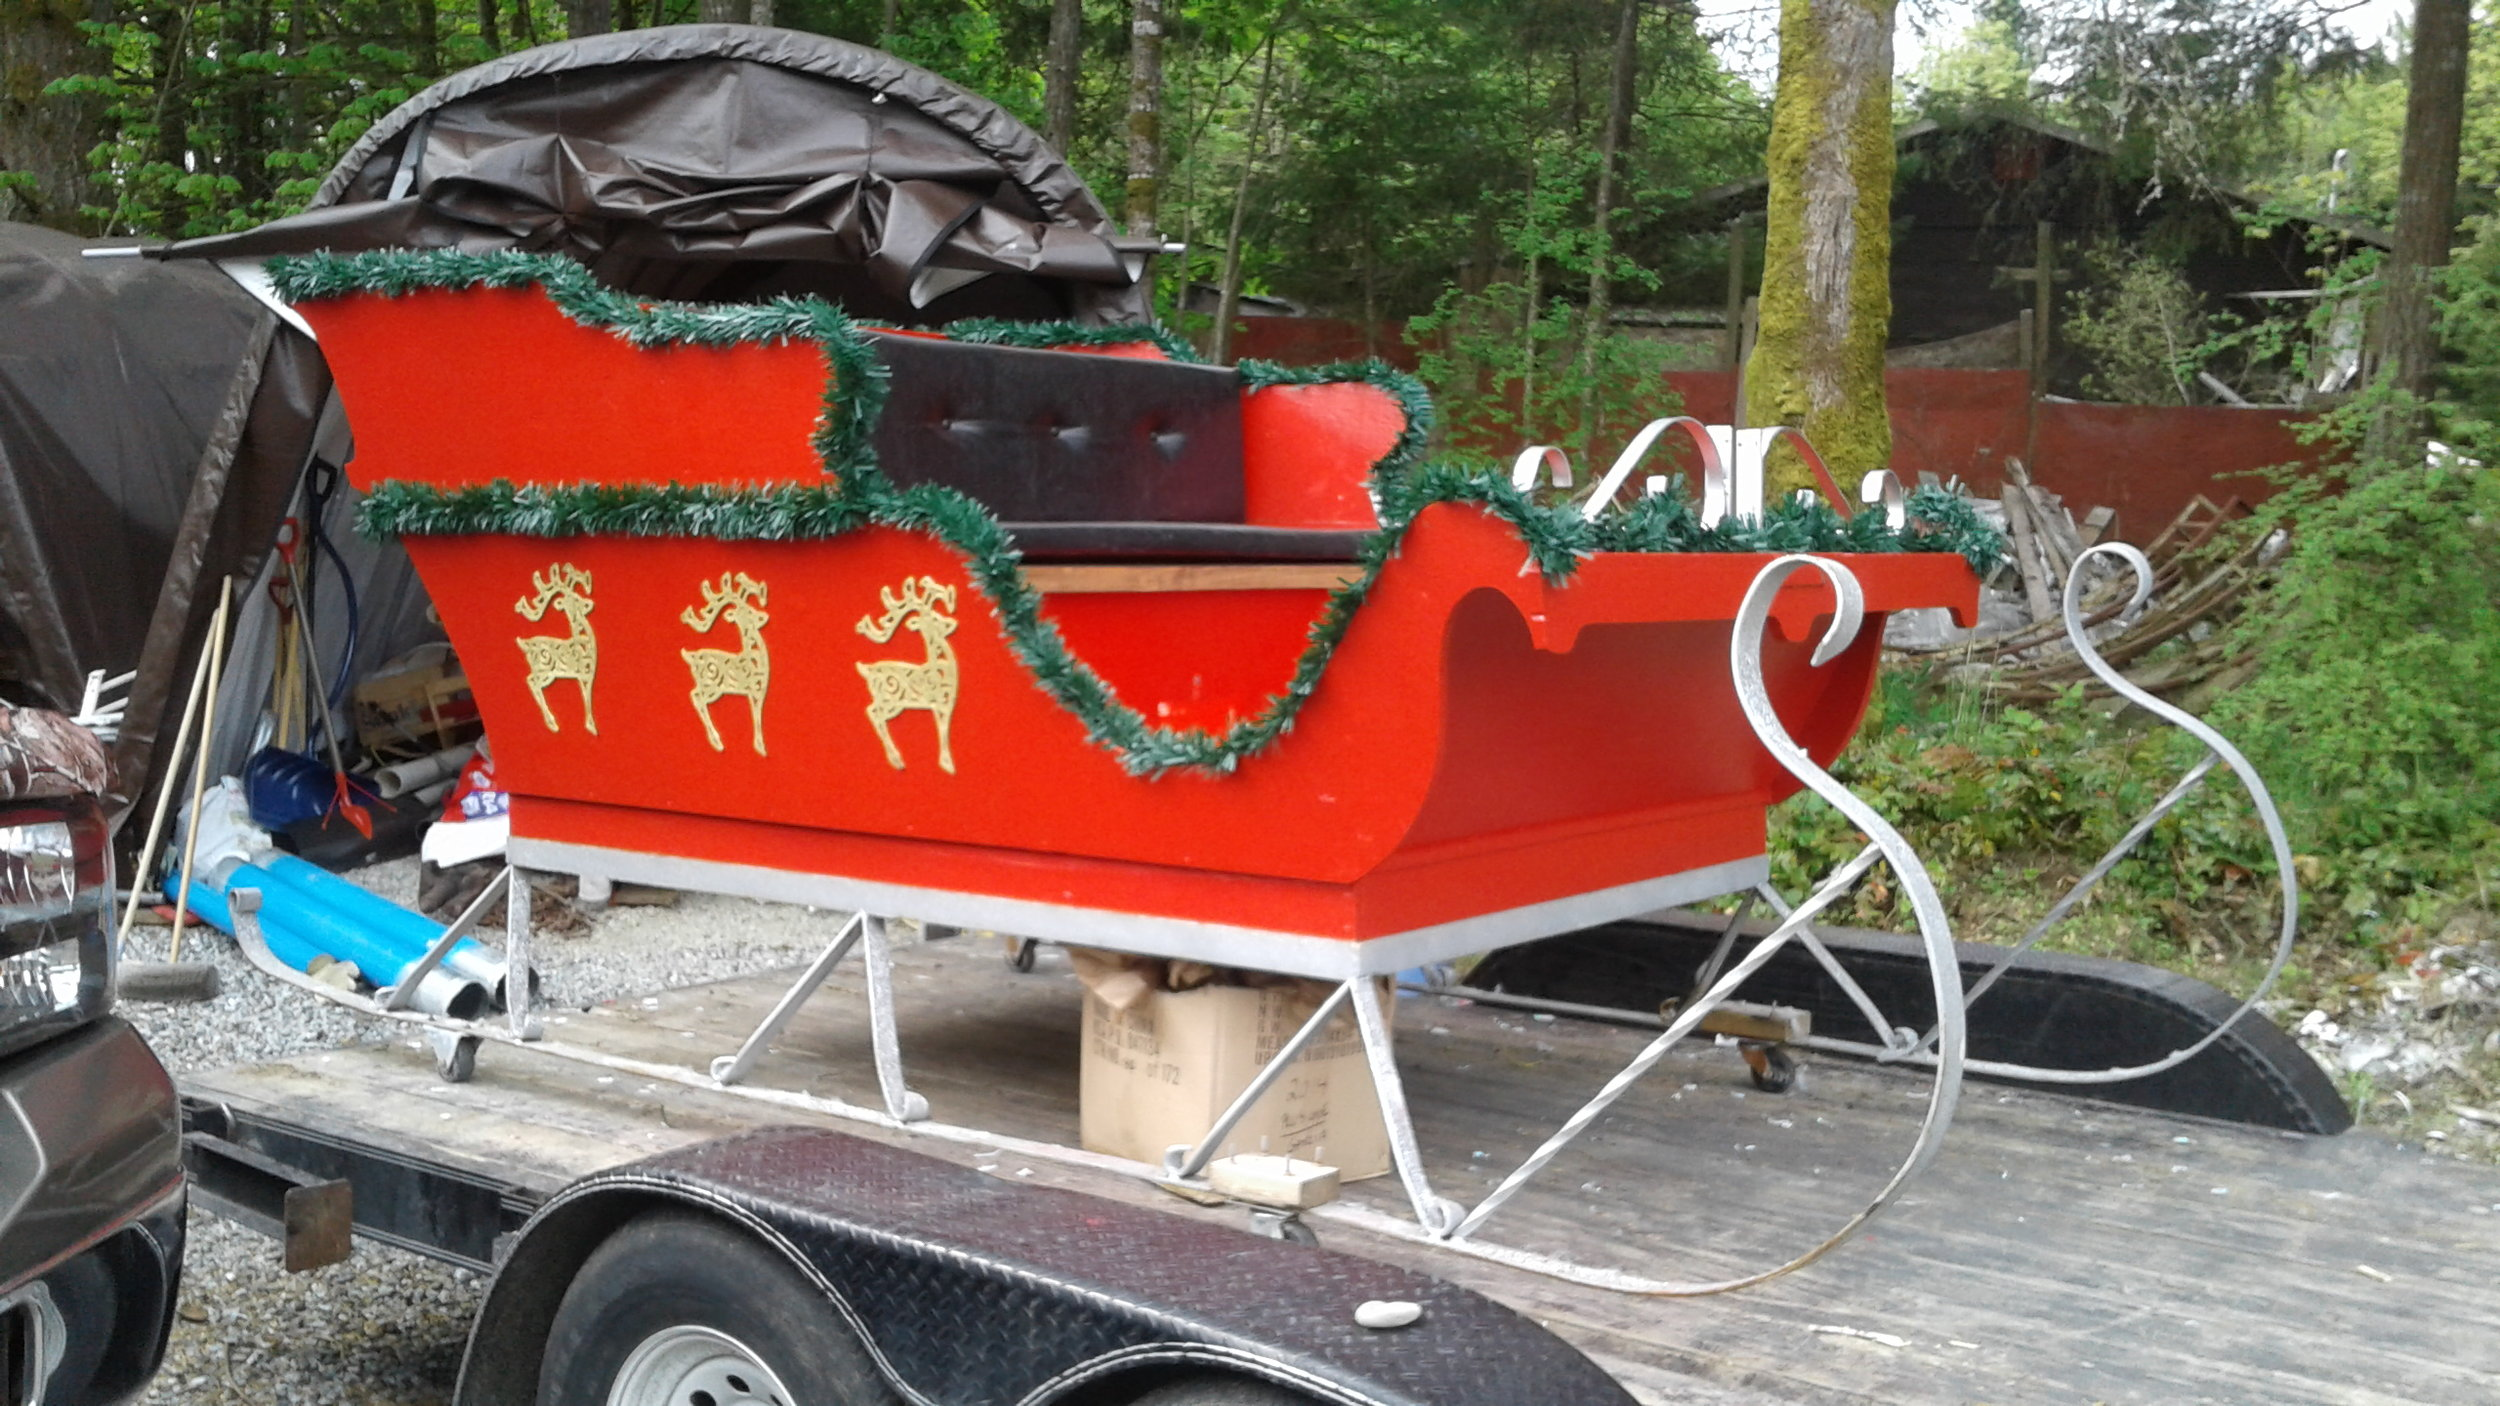 Repainted and decorated Santa's Sleigh (Runaway Christmas Bride; 2017)